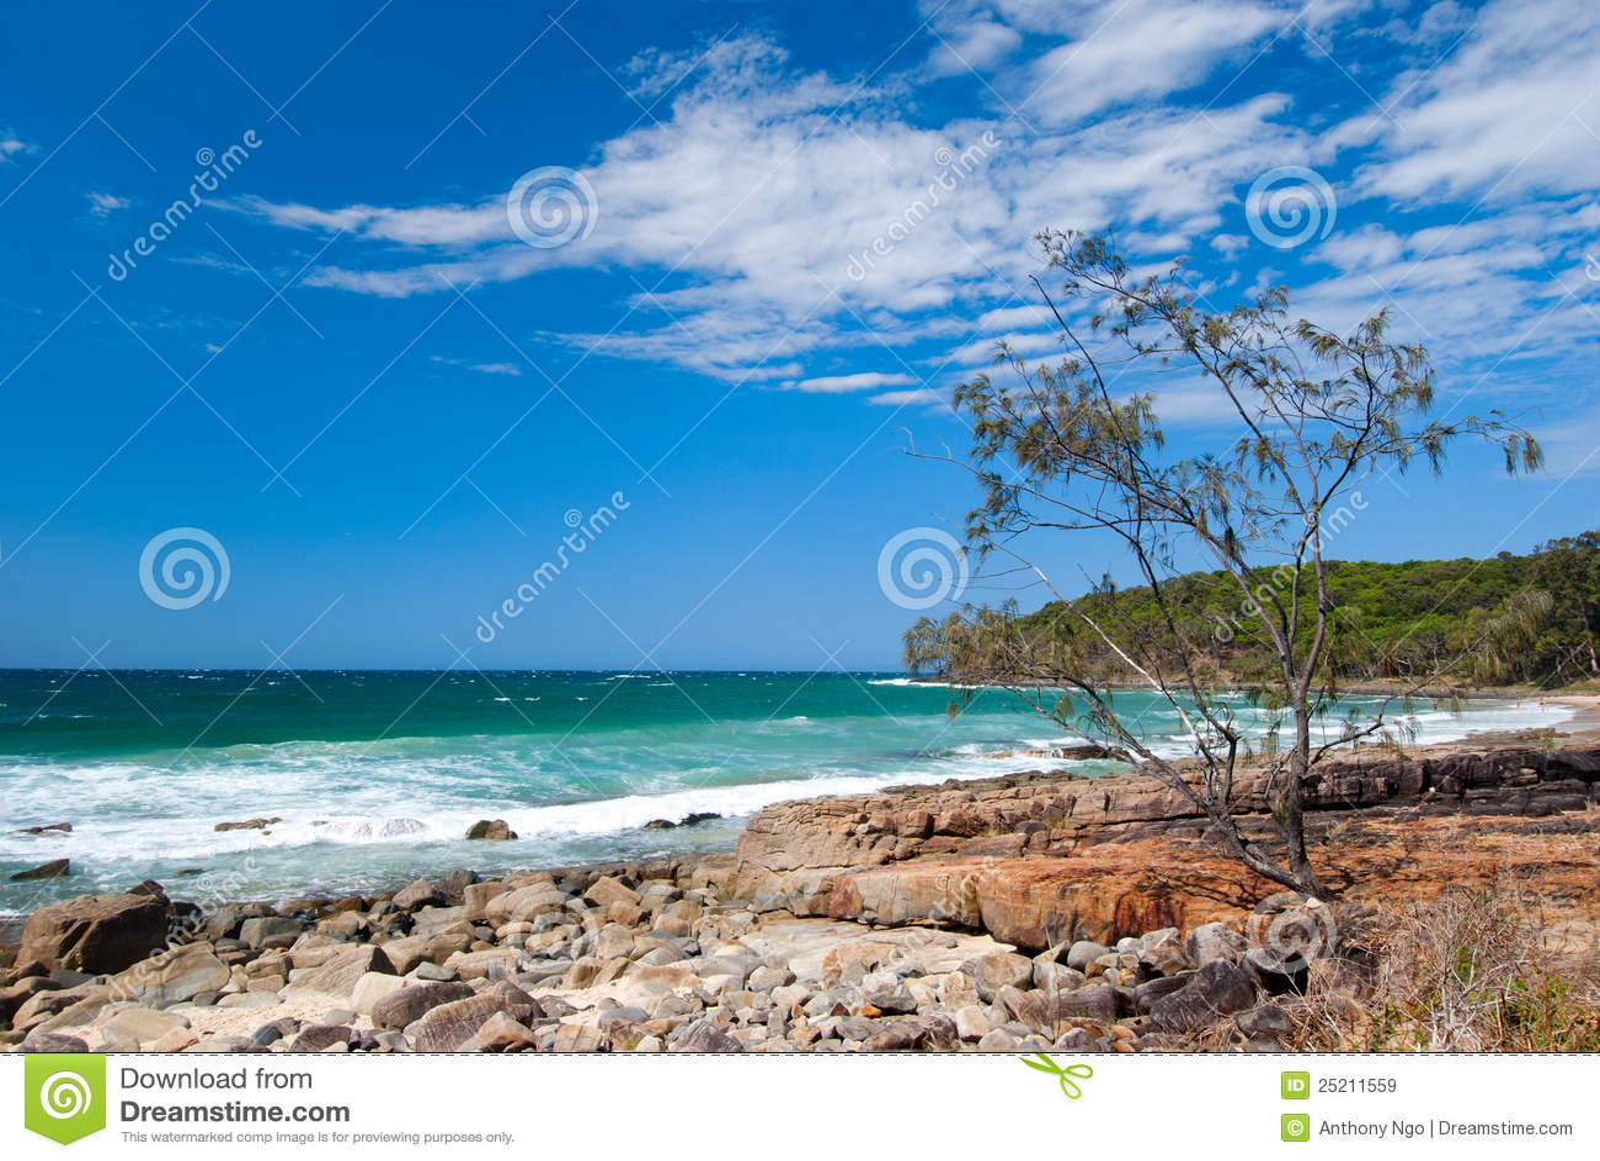 Noosa Beach - Queendsland - Australia Royalty Free Stock ...